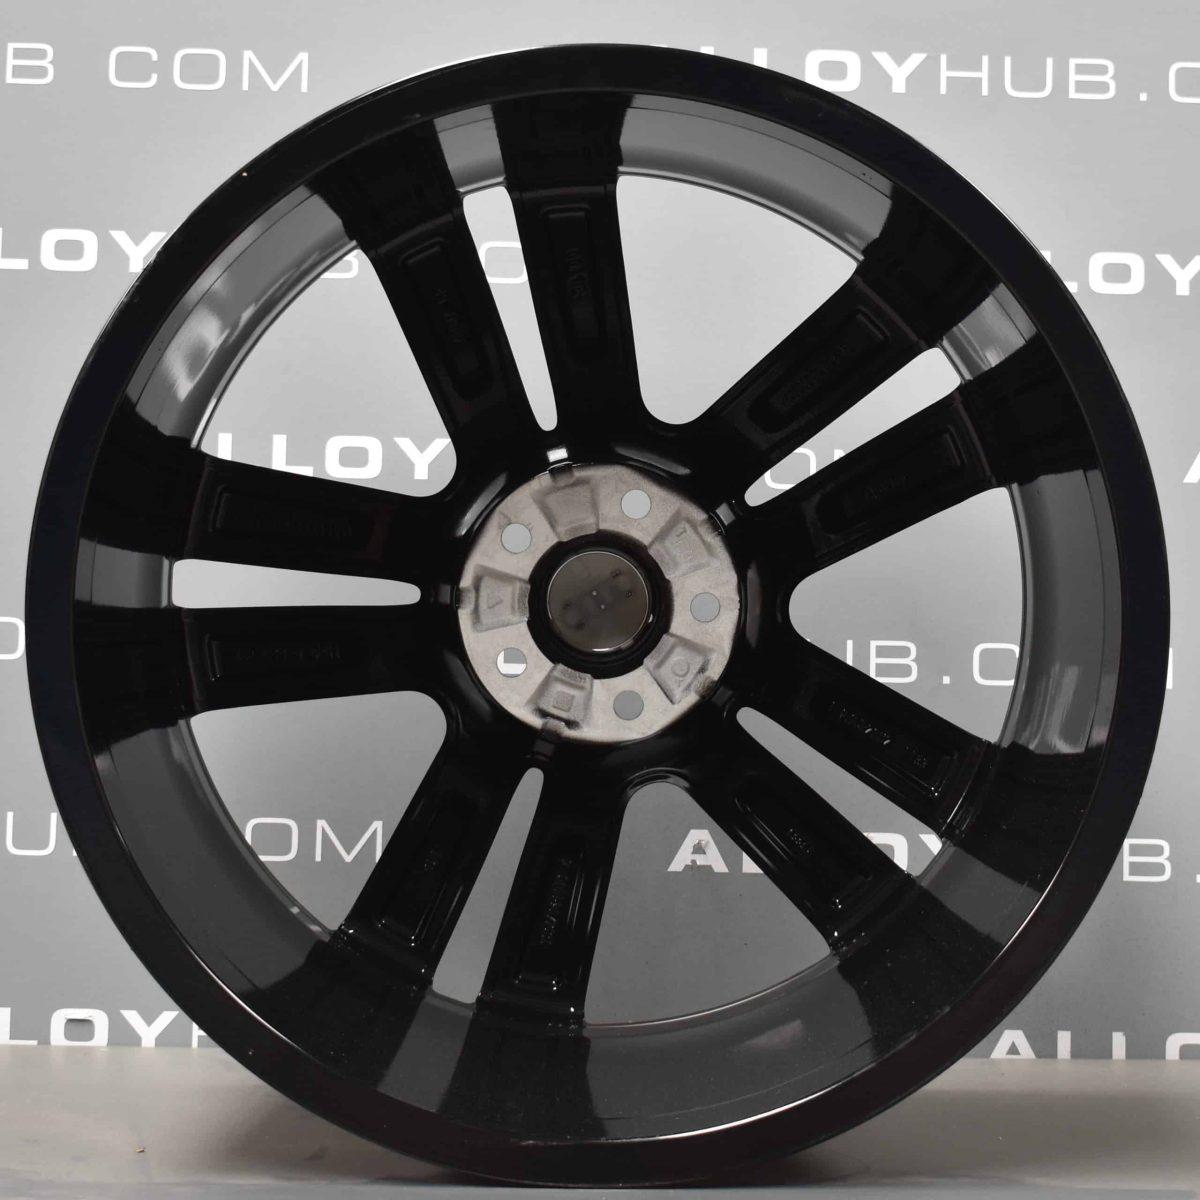 Genuine Audi Q7 4M 20″ Inch 5 Twin Spoke Alloy Wheels with Gloss Black Finish 4M0 601 025 H